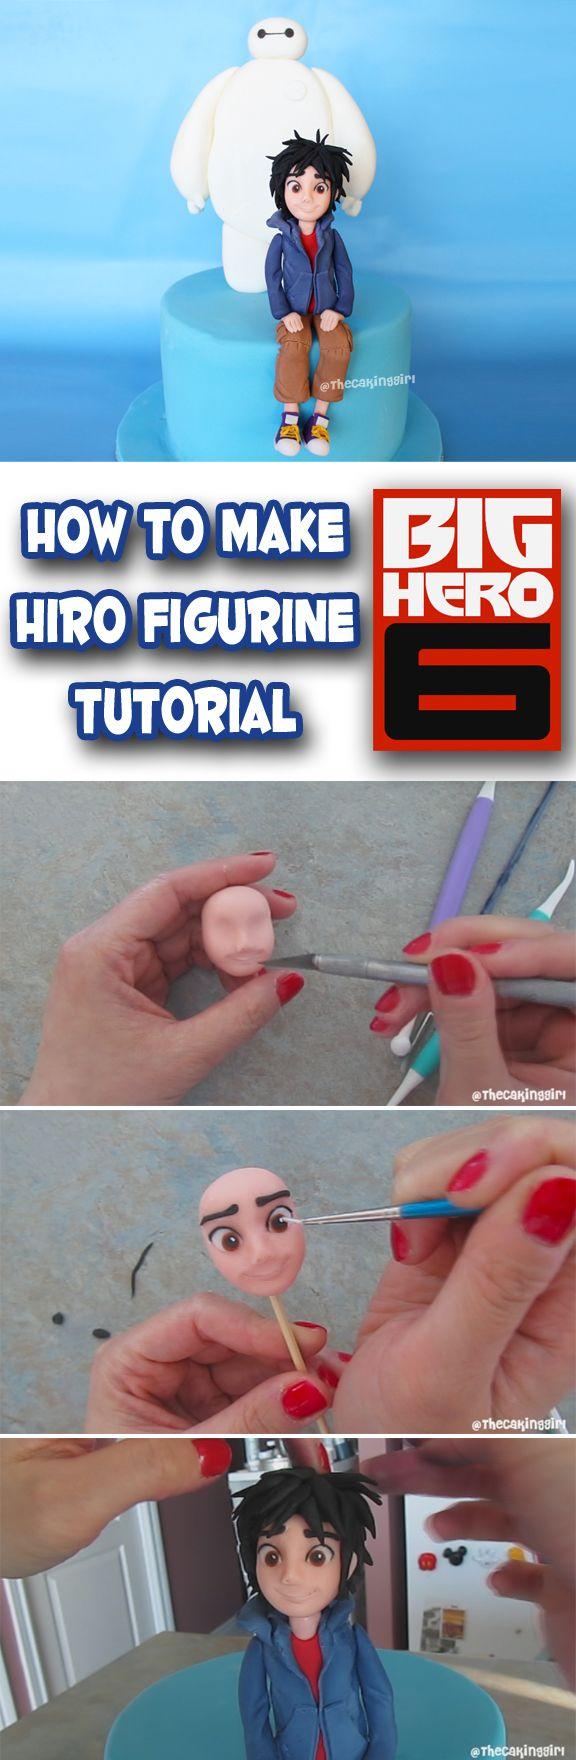 How to make Human Figurine Tutorial Hiro from Big Hero 6 Disney DIY cake topper Gumpaste/Fondant www.thecakinggirl.ca